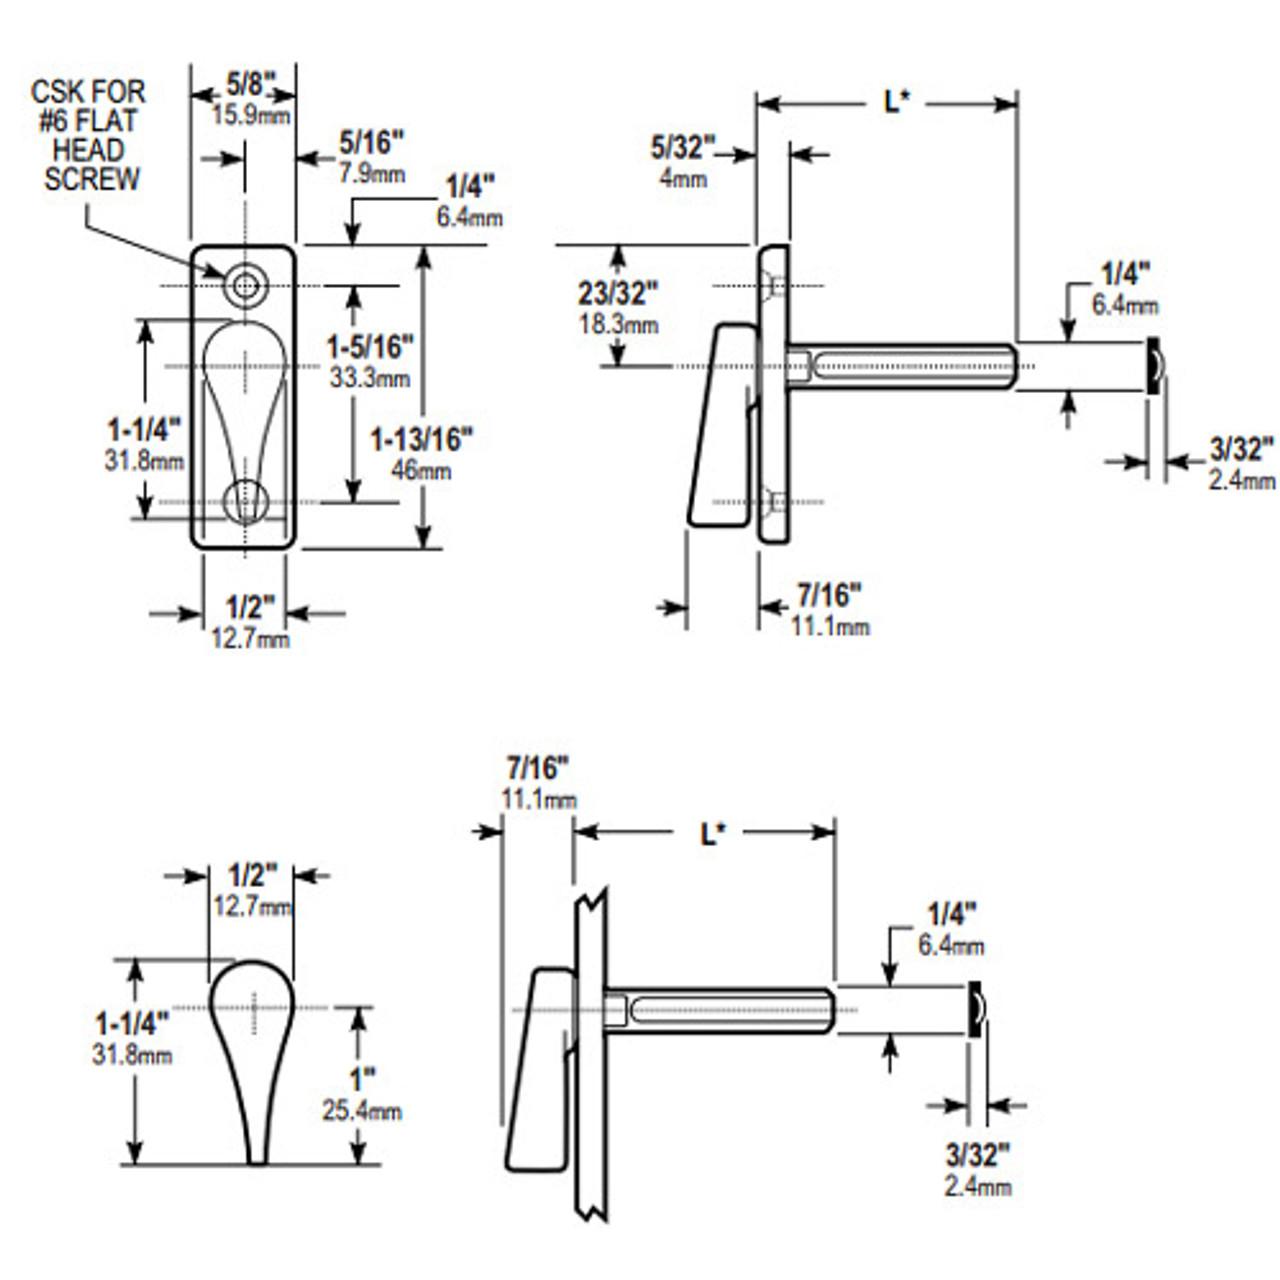 1000-21-13-121 Adams Rite 1000 Series Turns Dimensional View